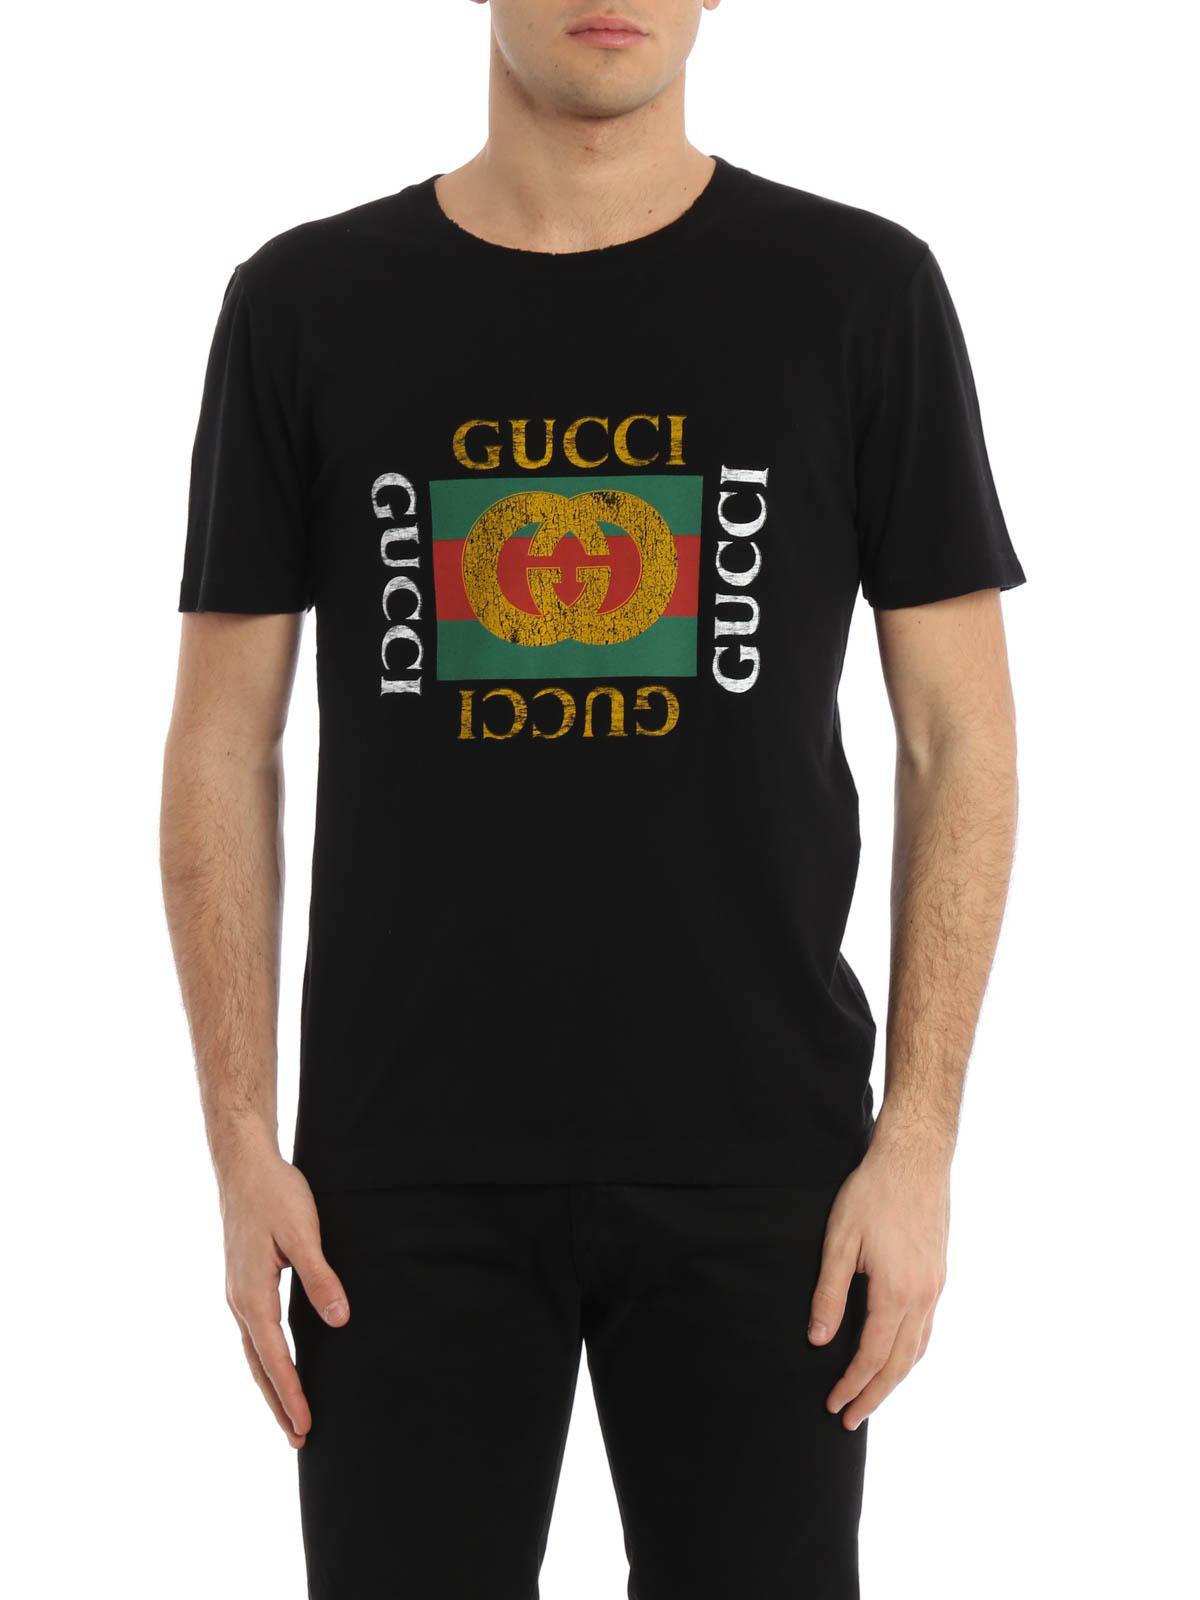 Logo print jersey t shirt by gucci t shirts ikrix for Logo t shirts online